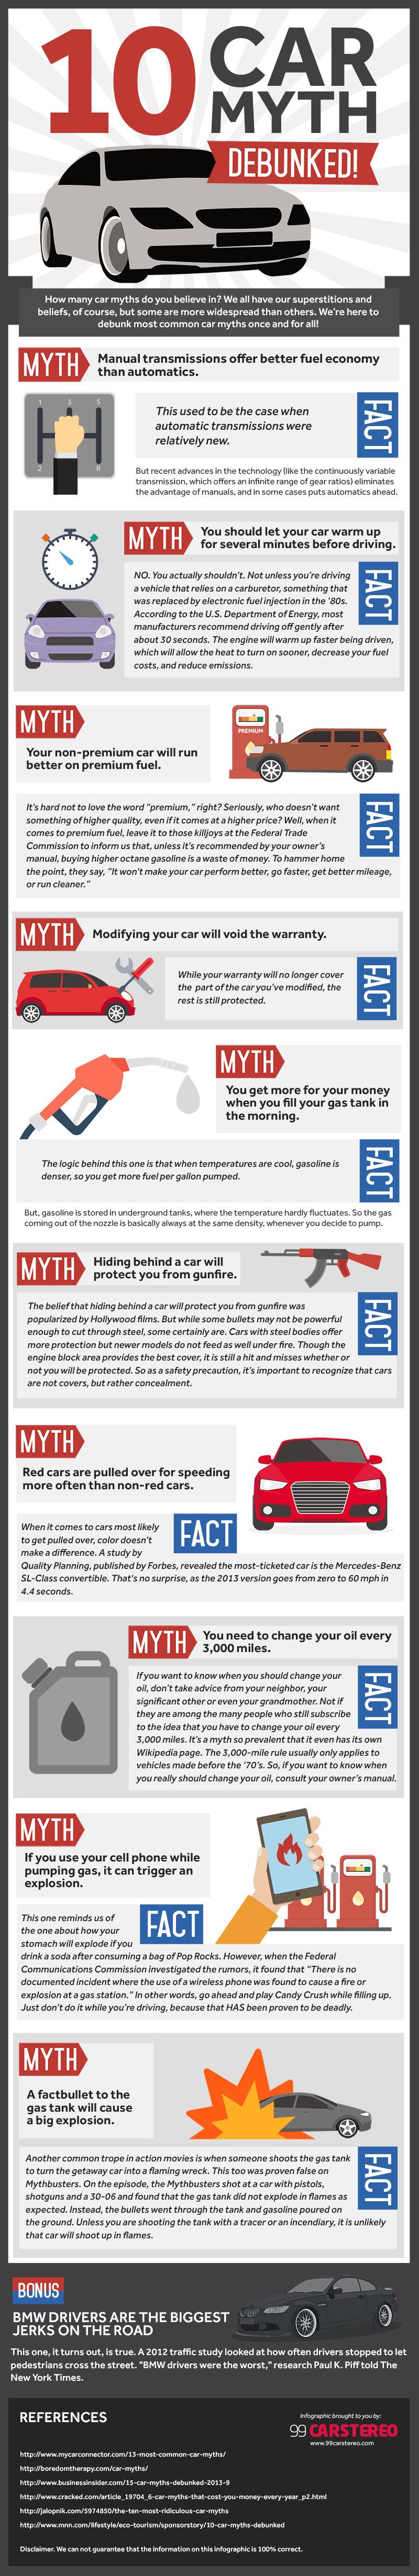 10 Car Myths Debunked!